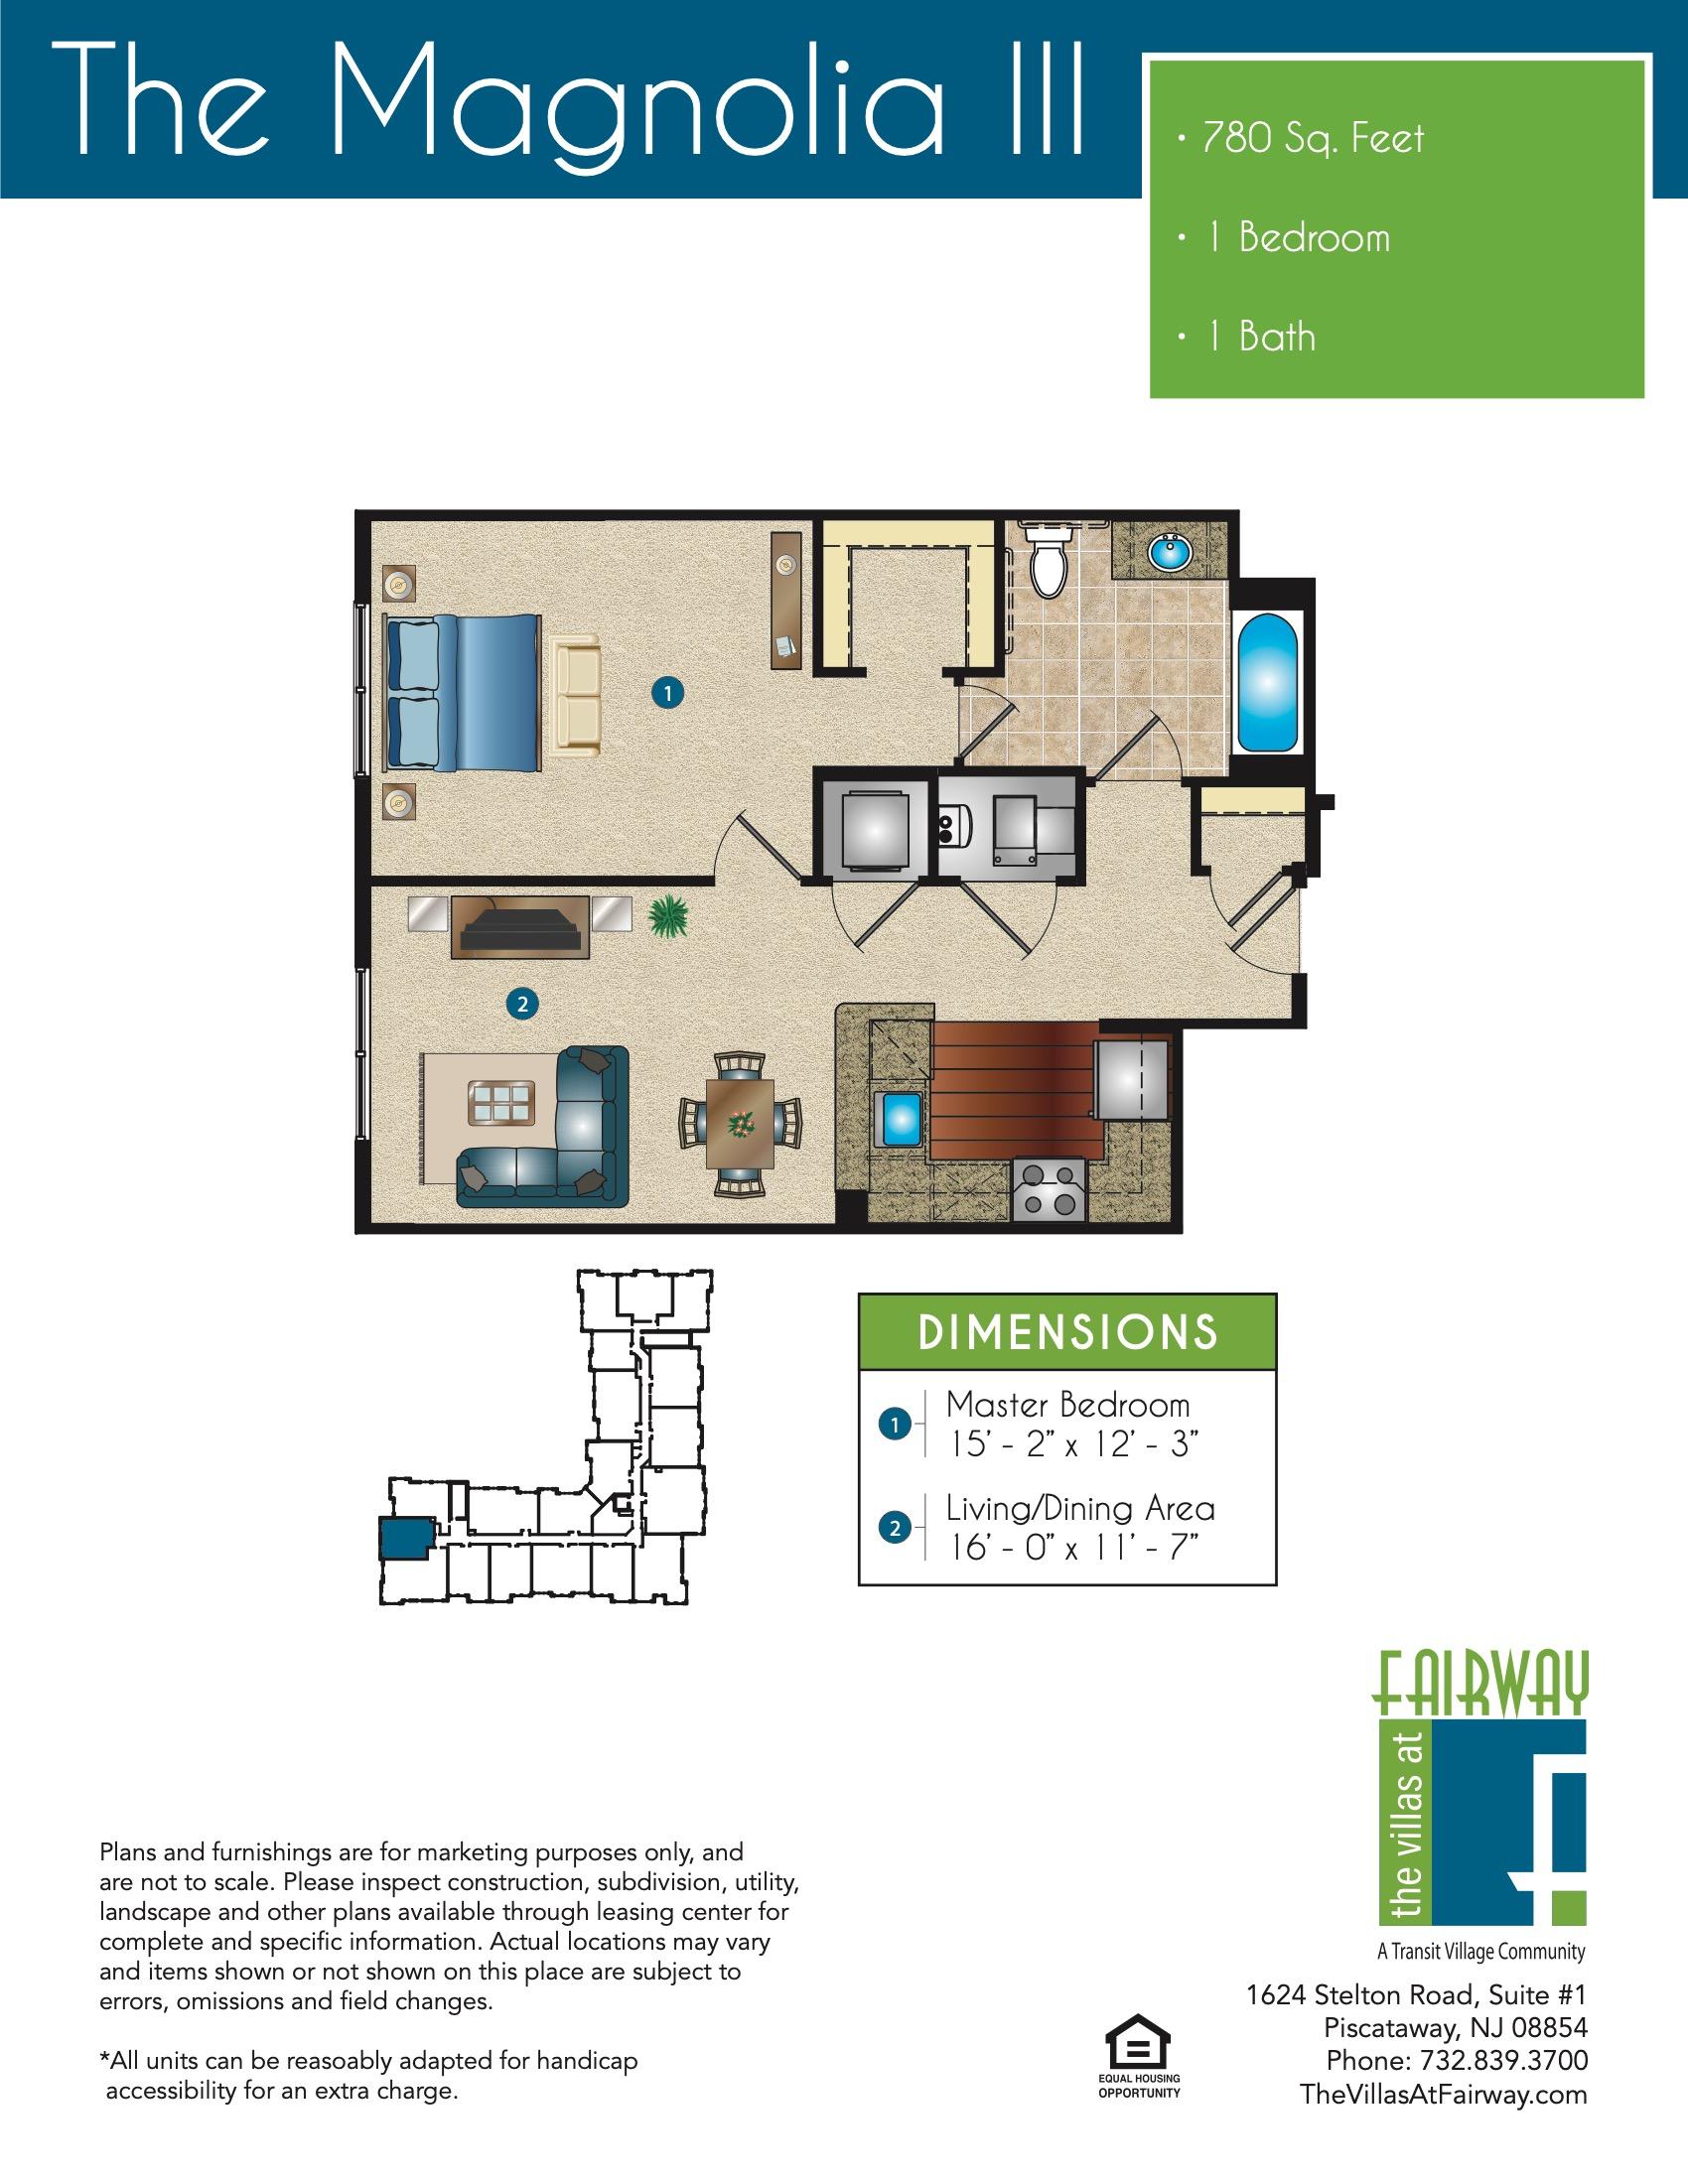 The Magnolia III Floor Plan